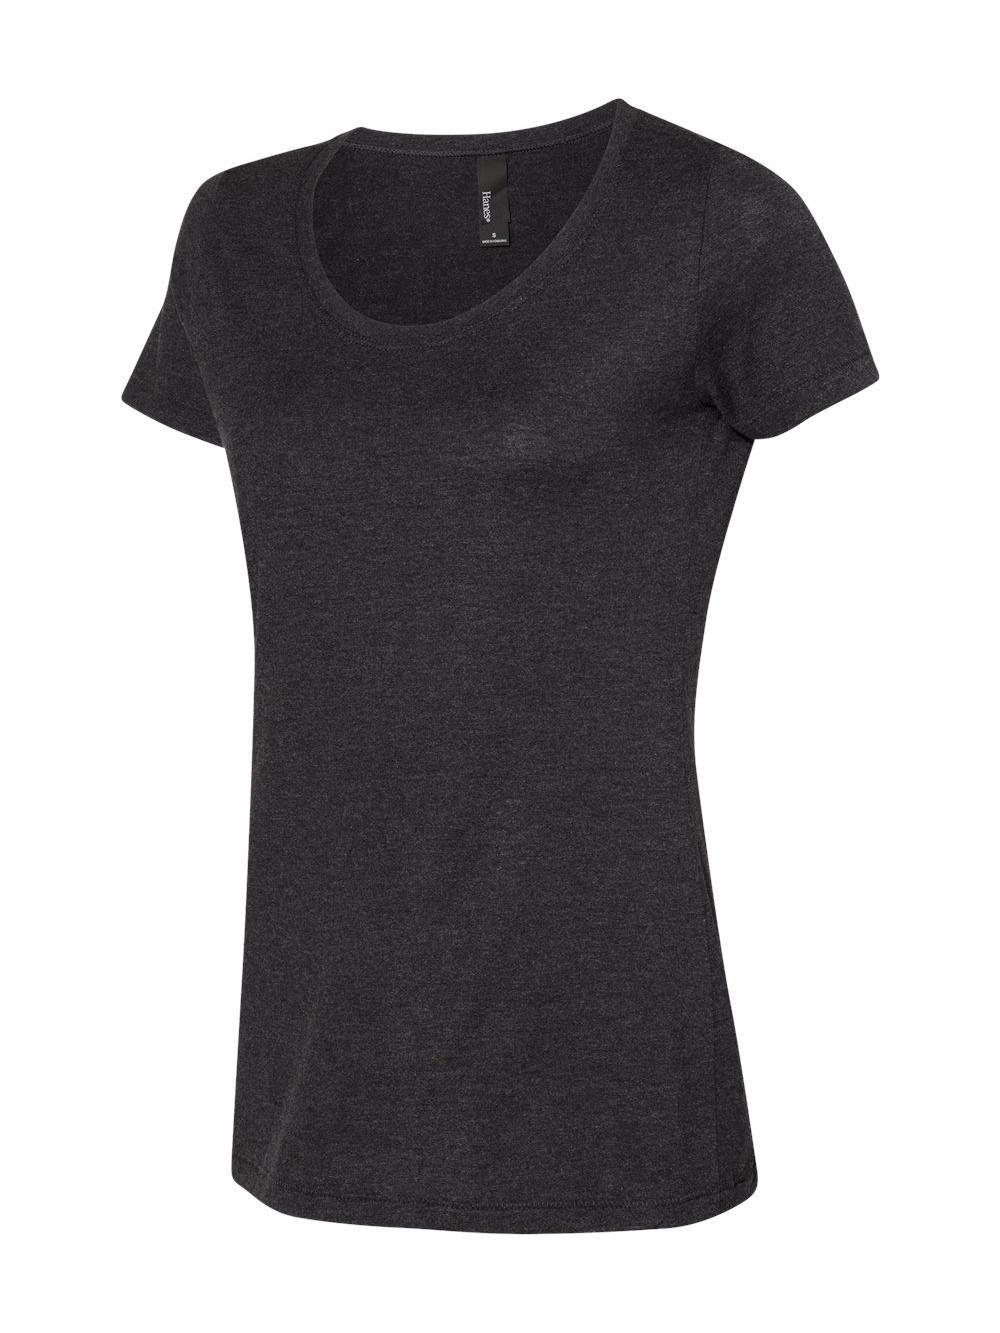 Hanes-Women-039-s-Modal-Triblend-T-Shirt-MO150 thumbnail 2